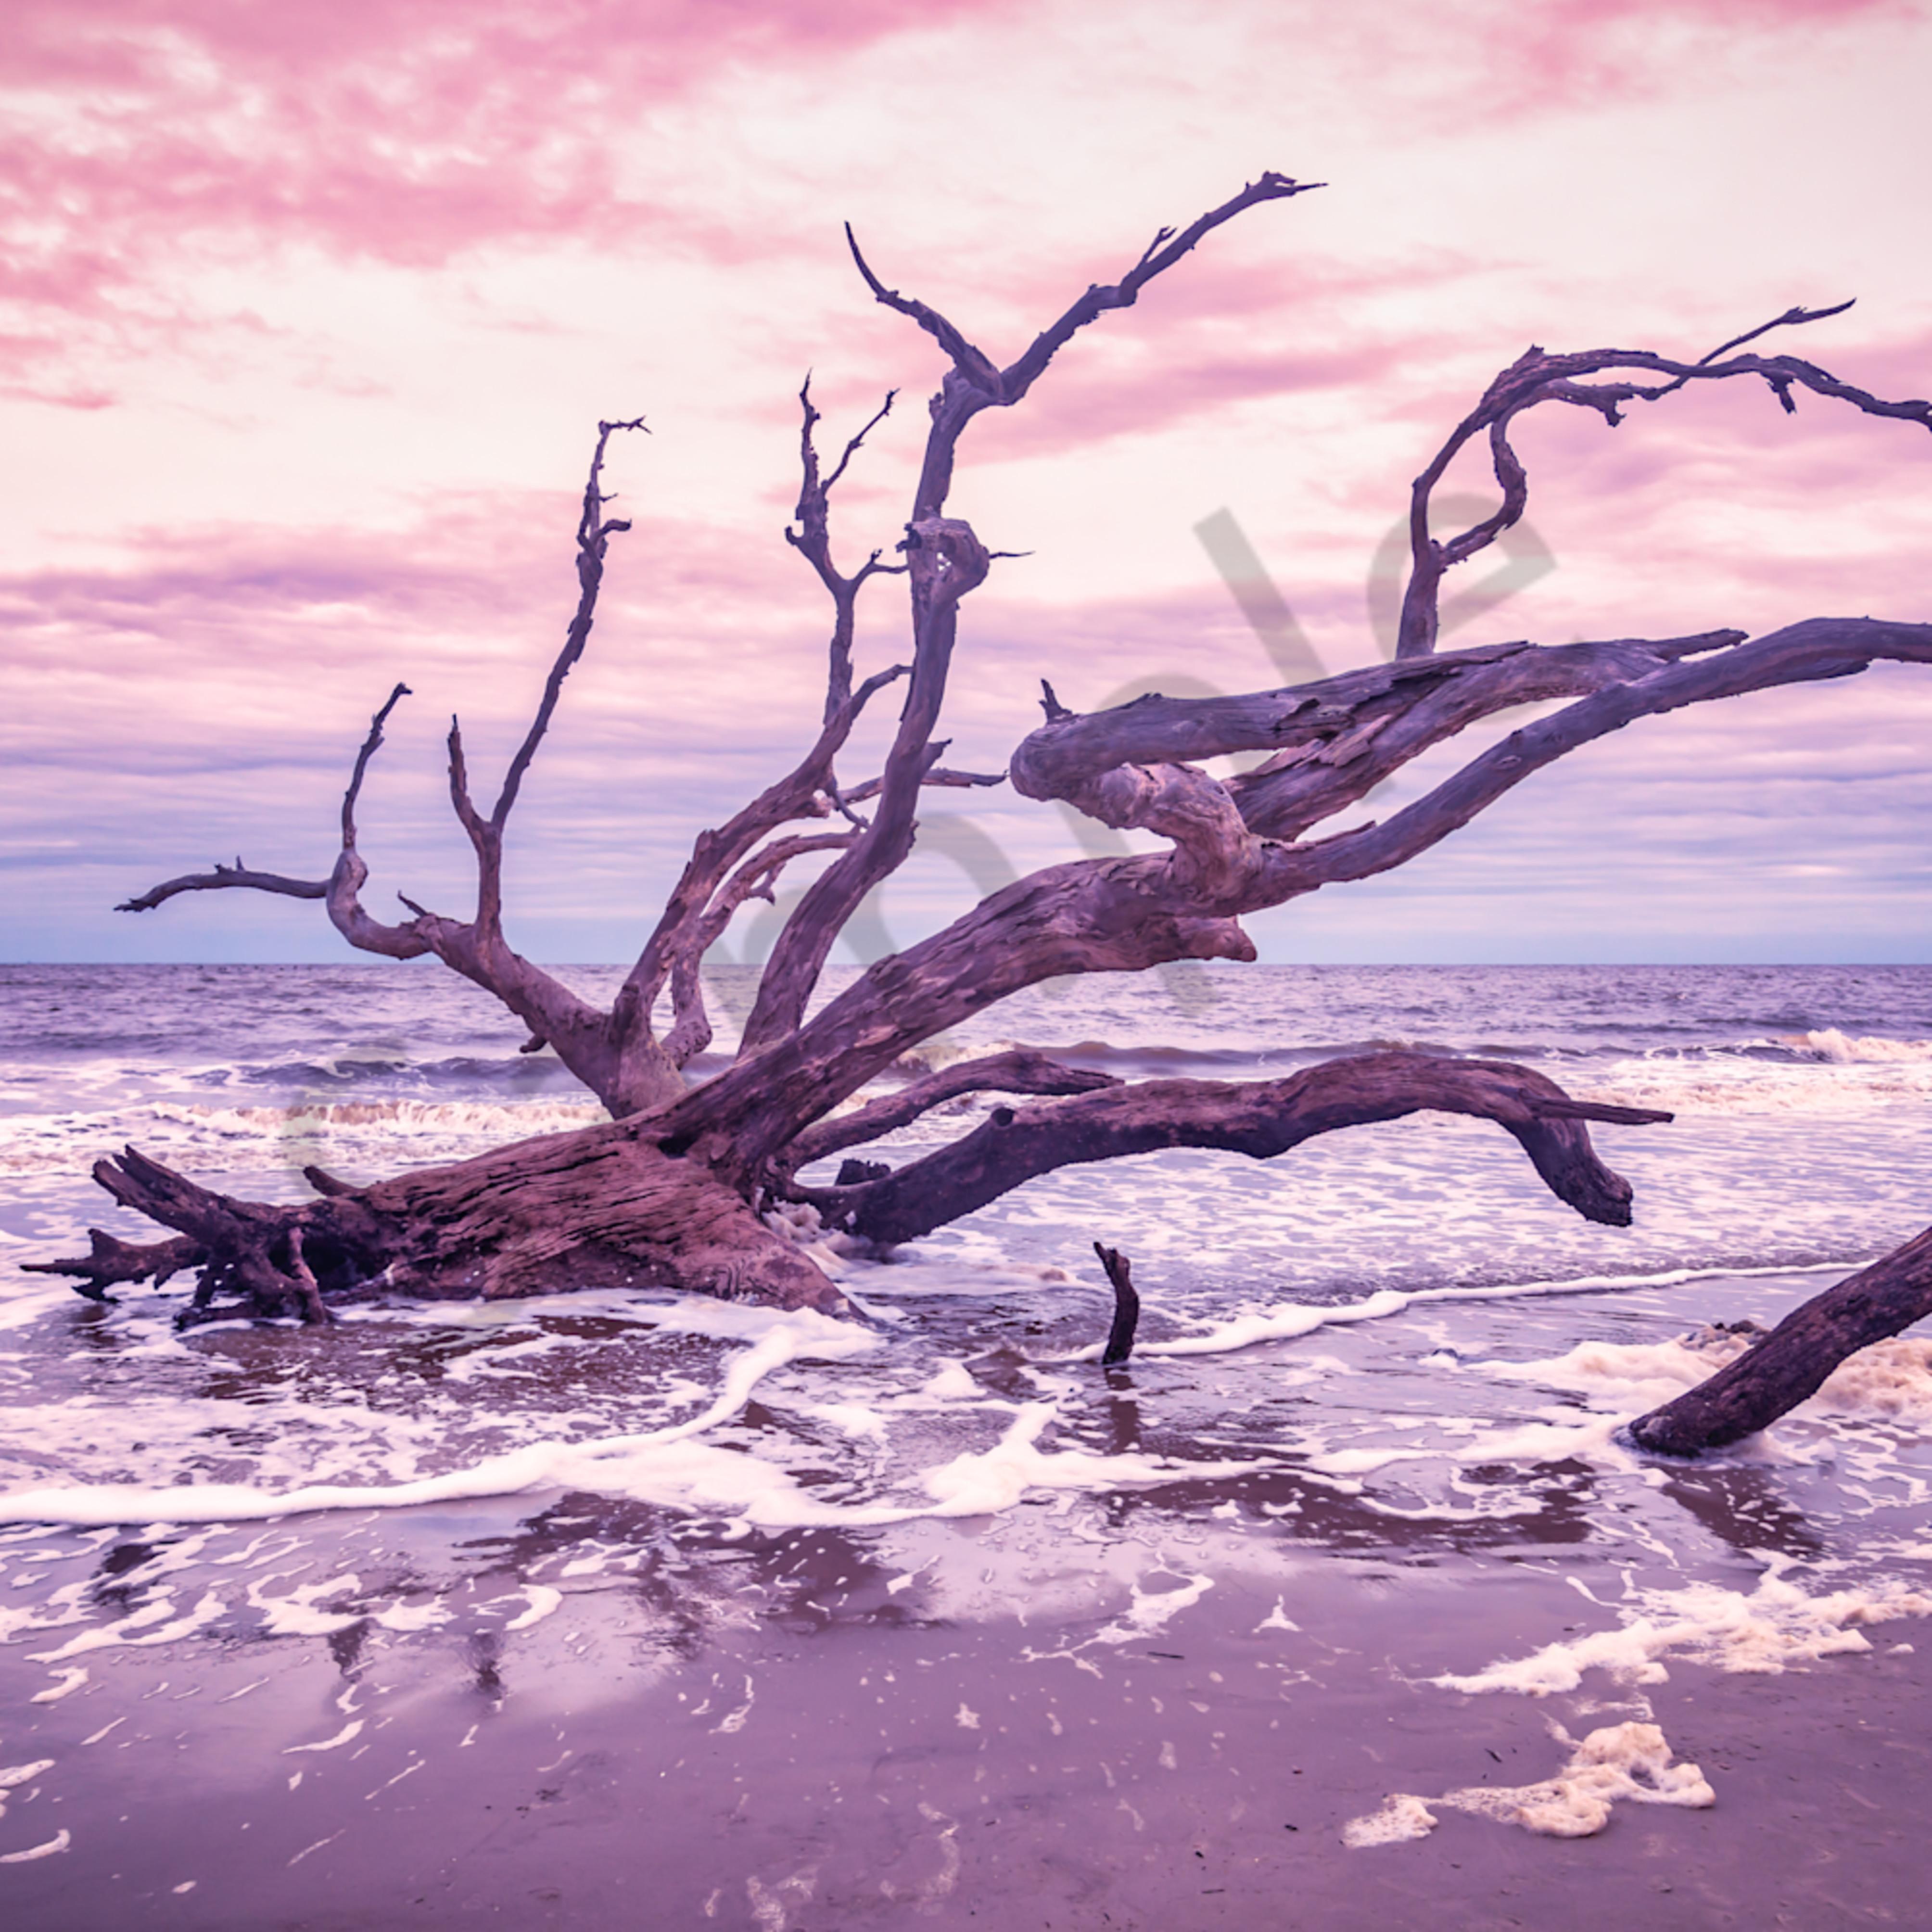 Jekyll island sunset ysezsb